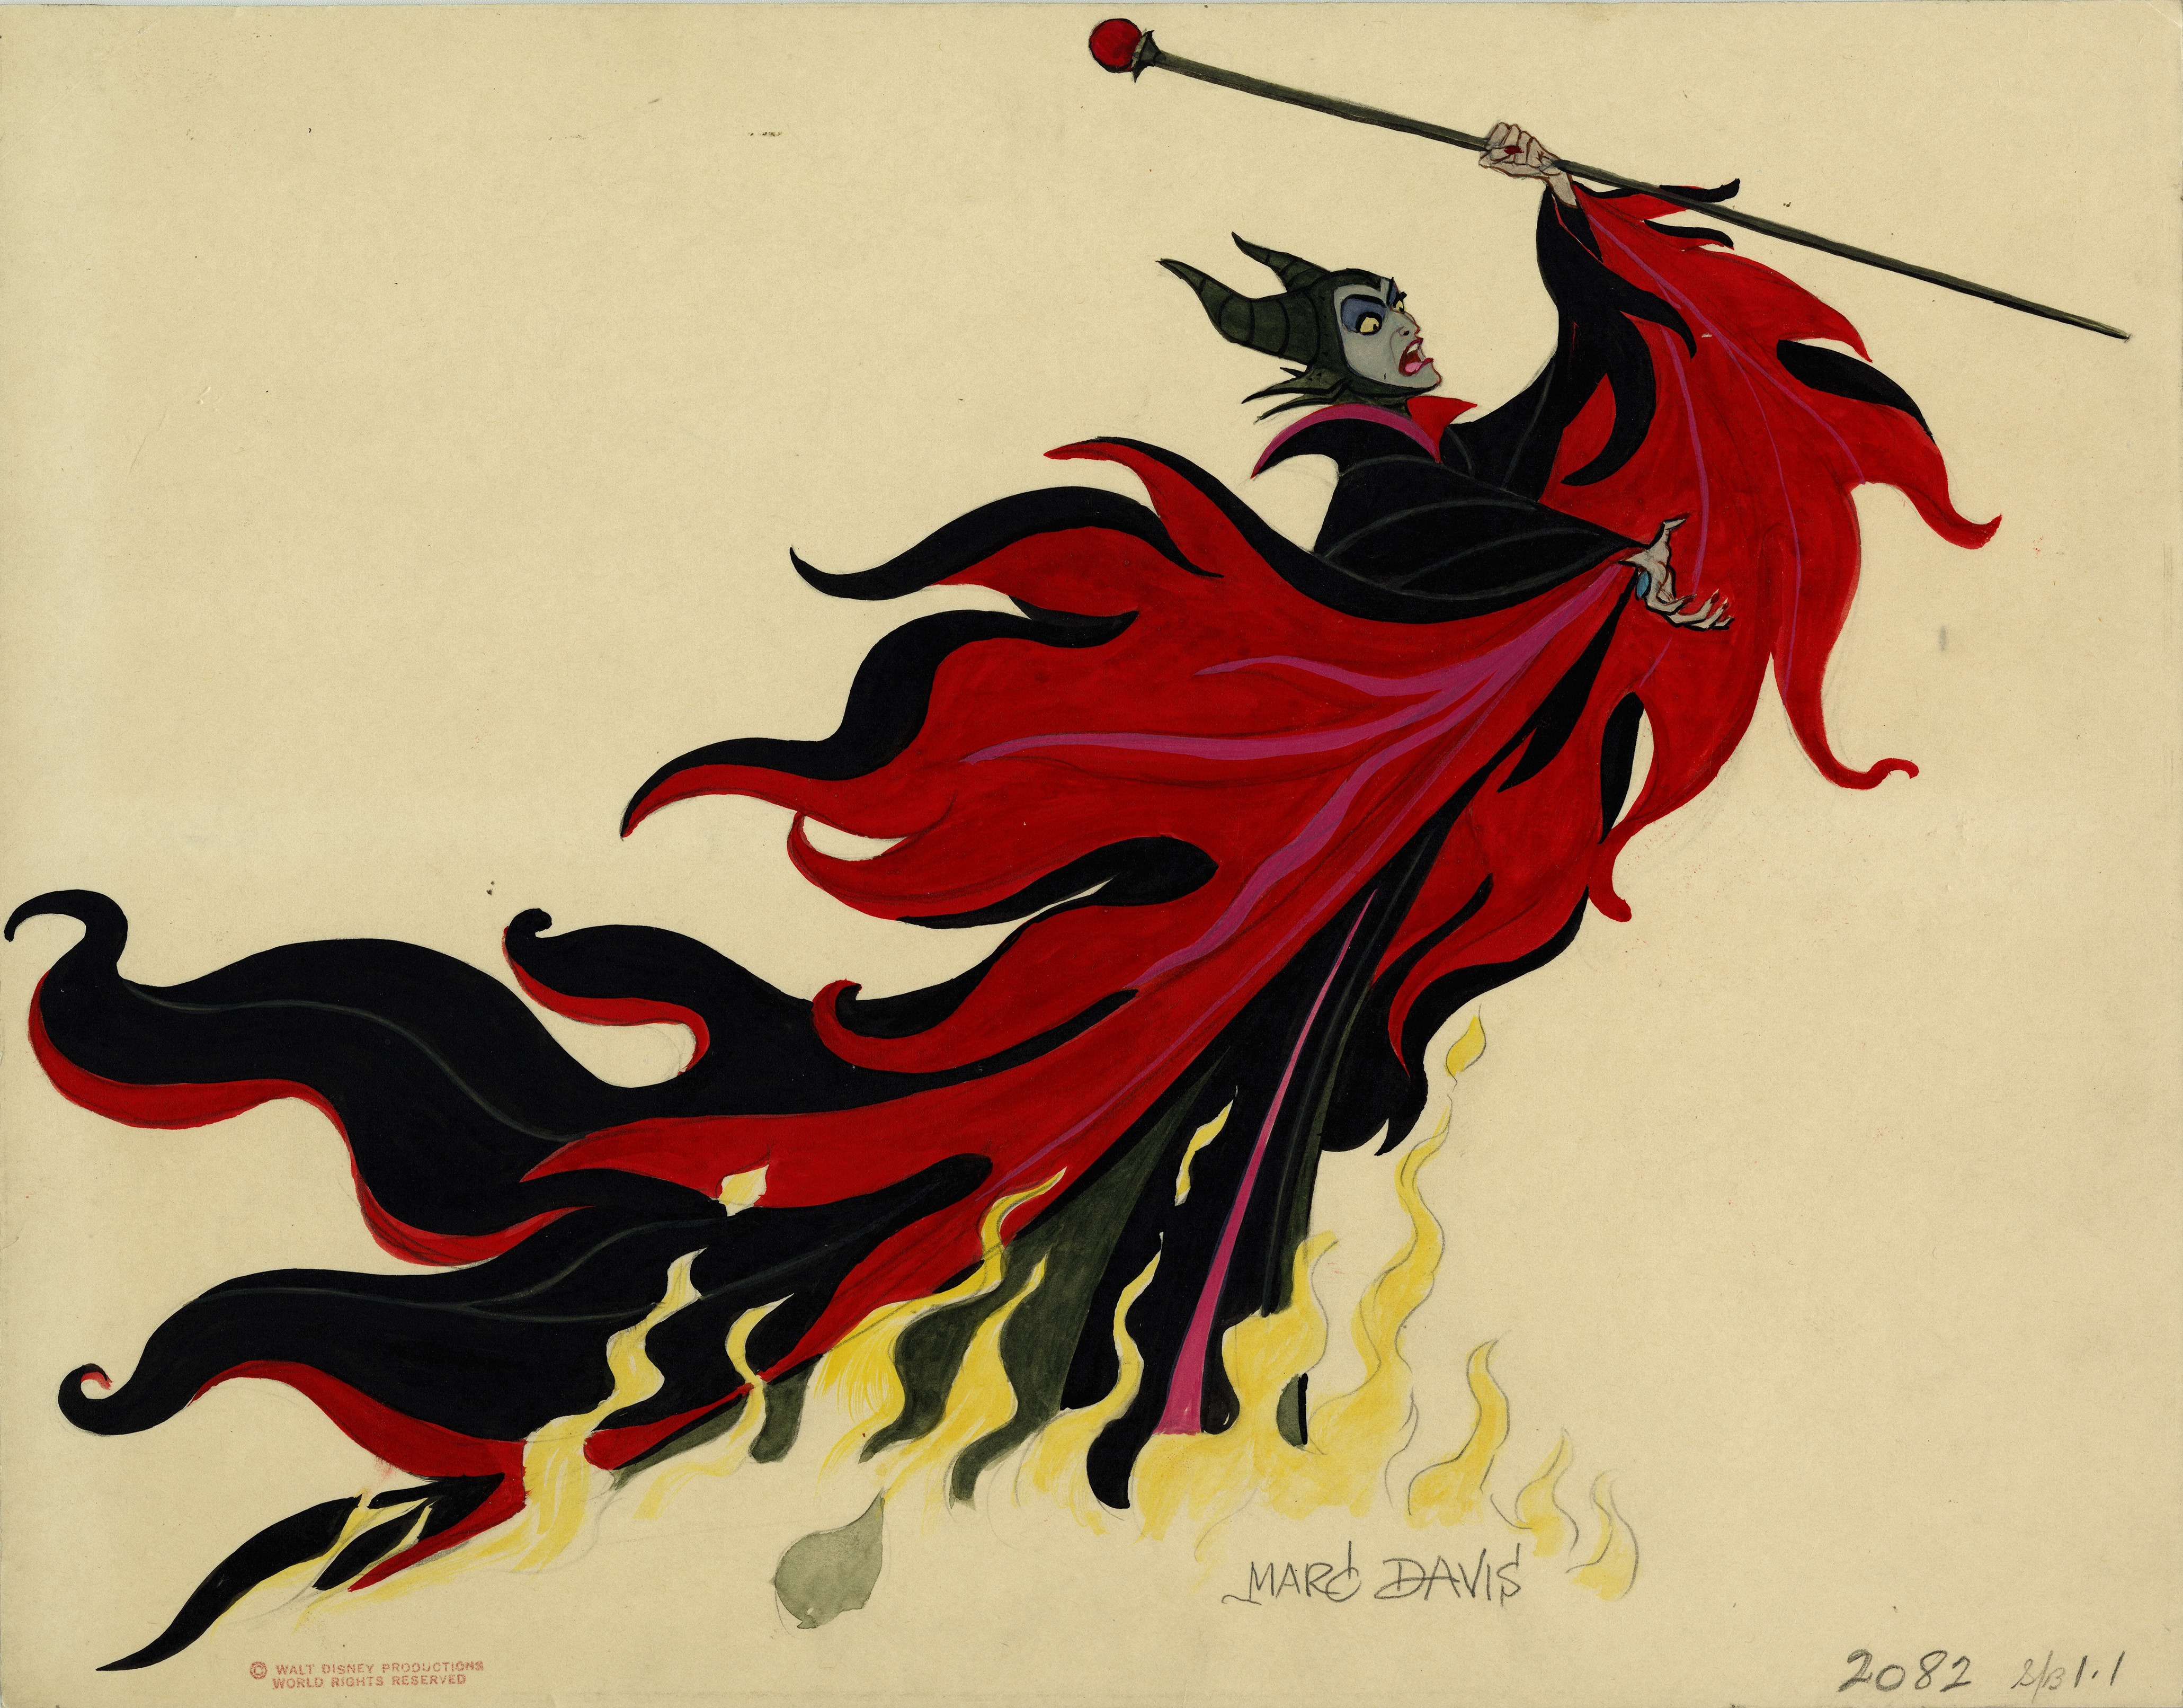 File:Maleficent design.JPG